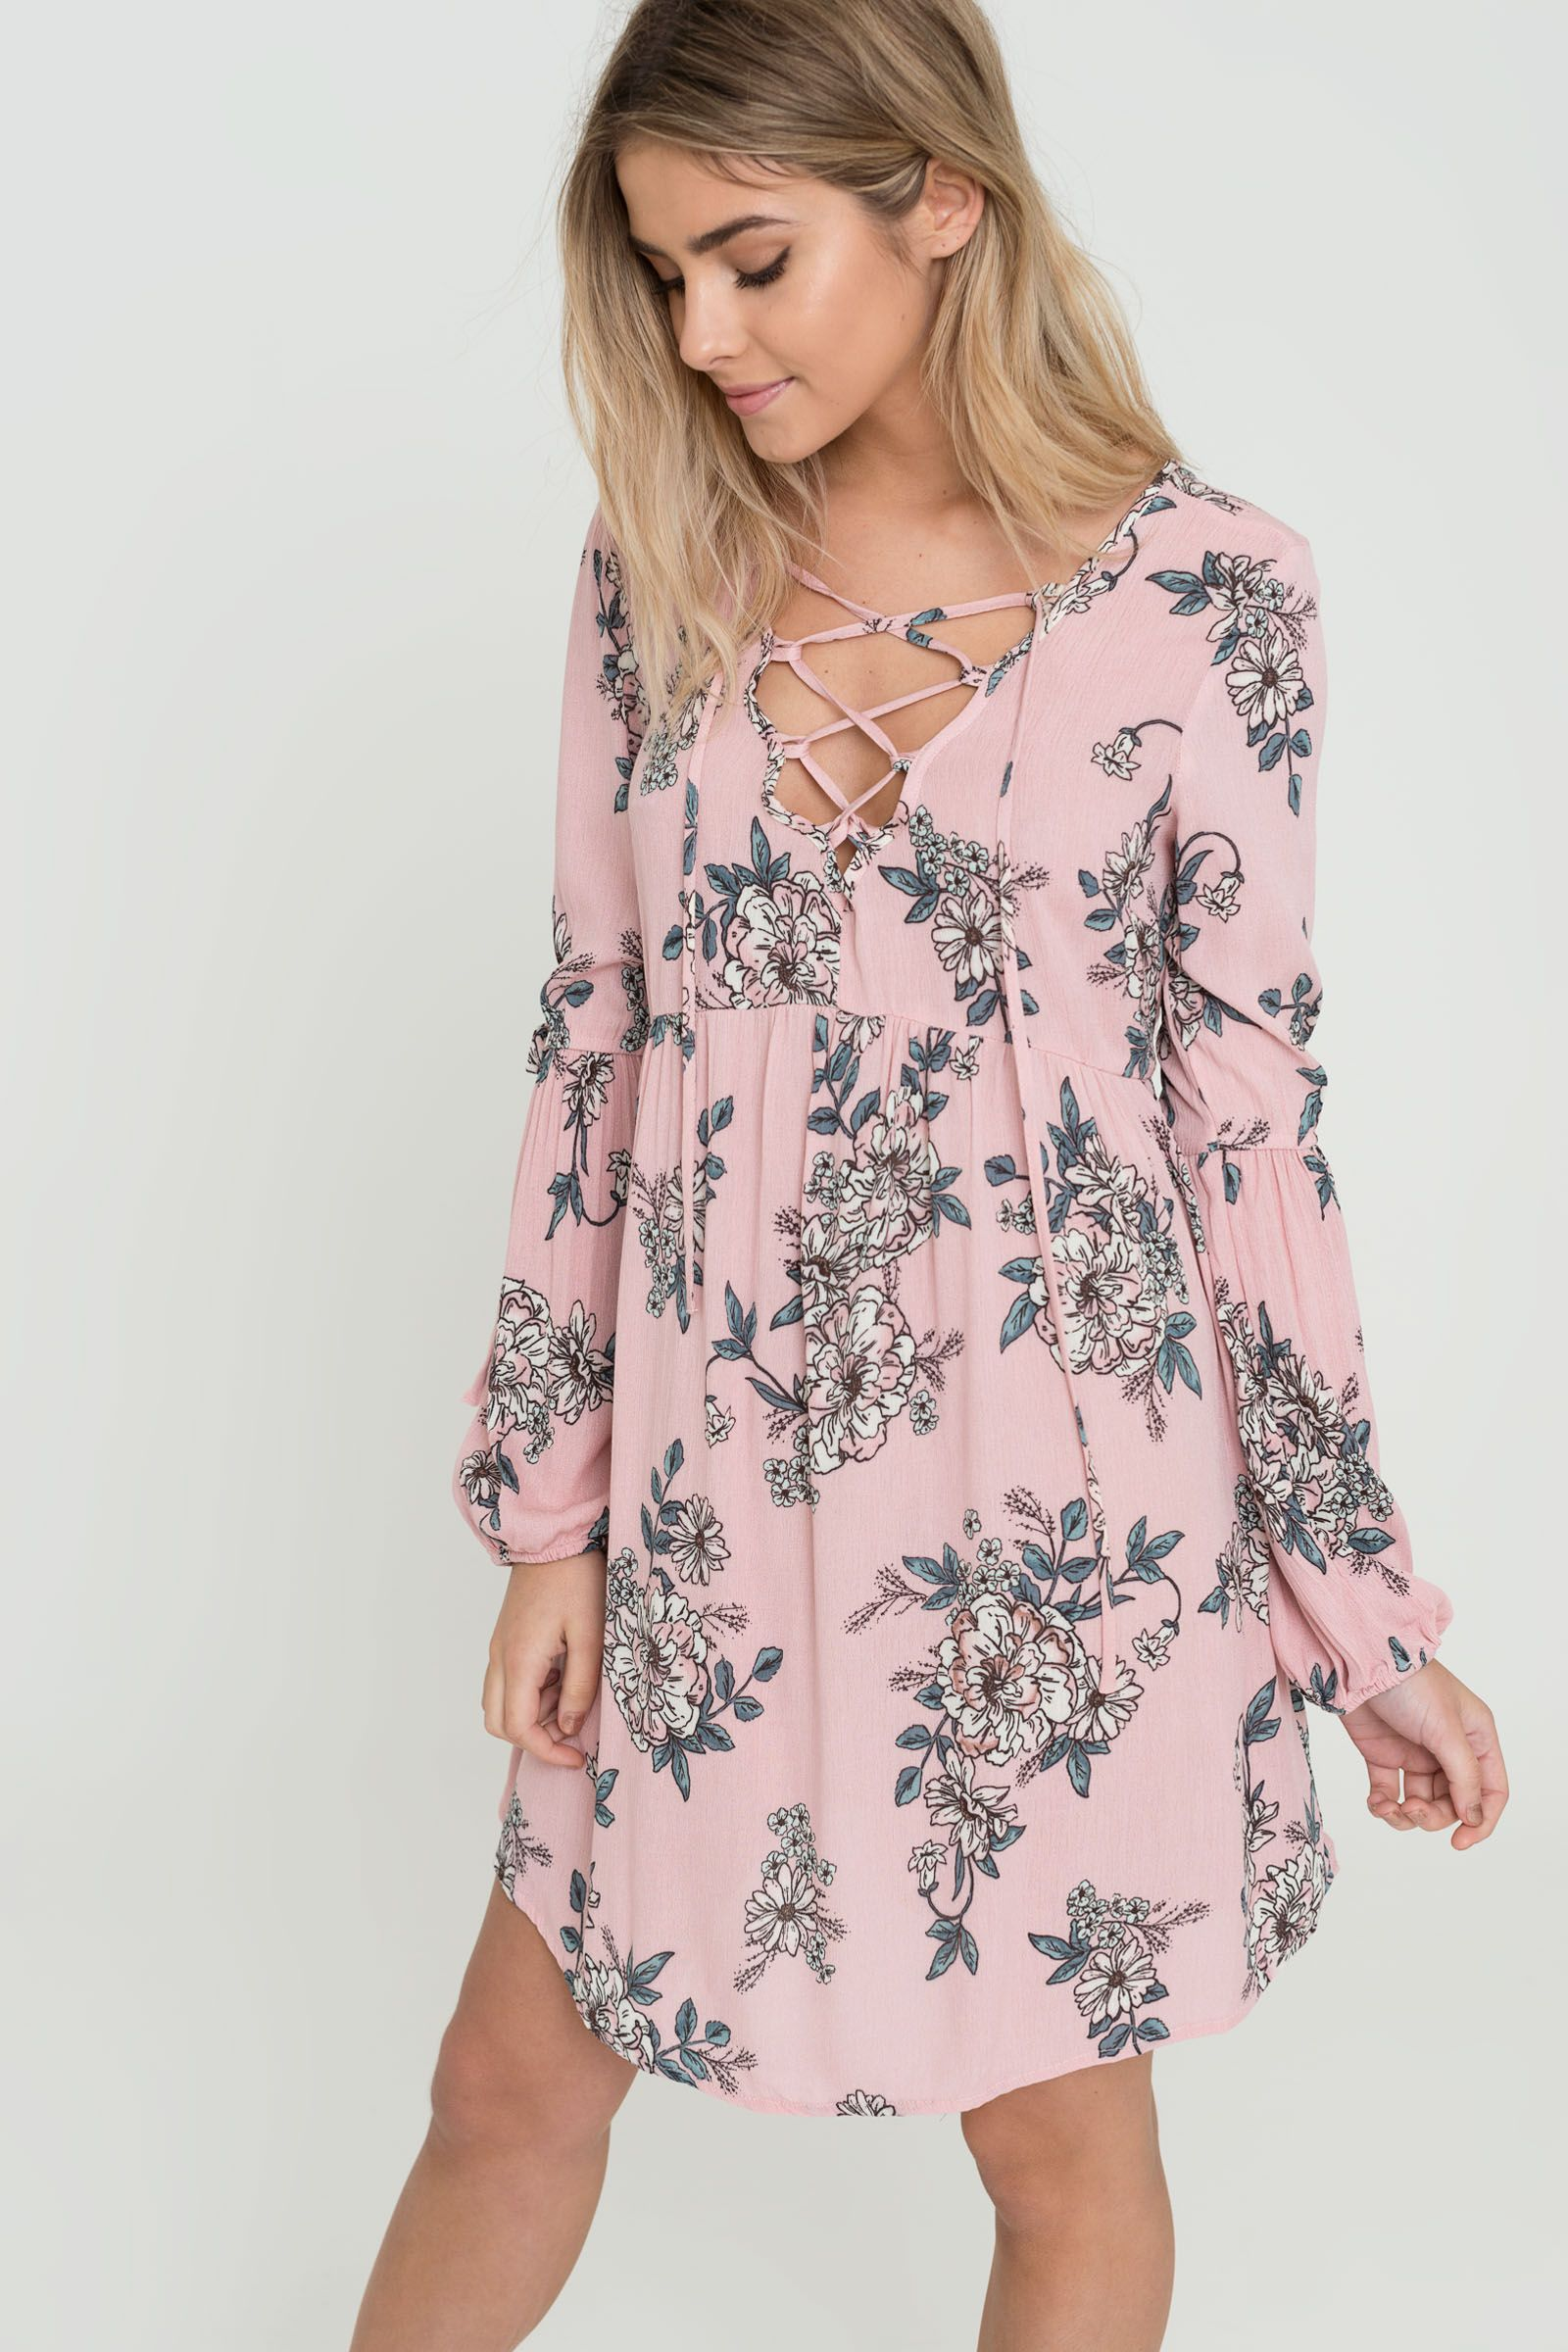 d97e6385aa0412 Airy semi-sheer mini dress. Crepe weave. Deep laced V-neck. Empire ...